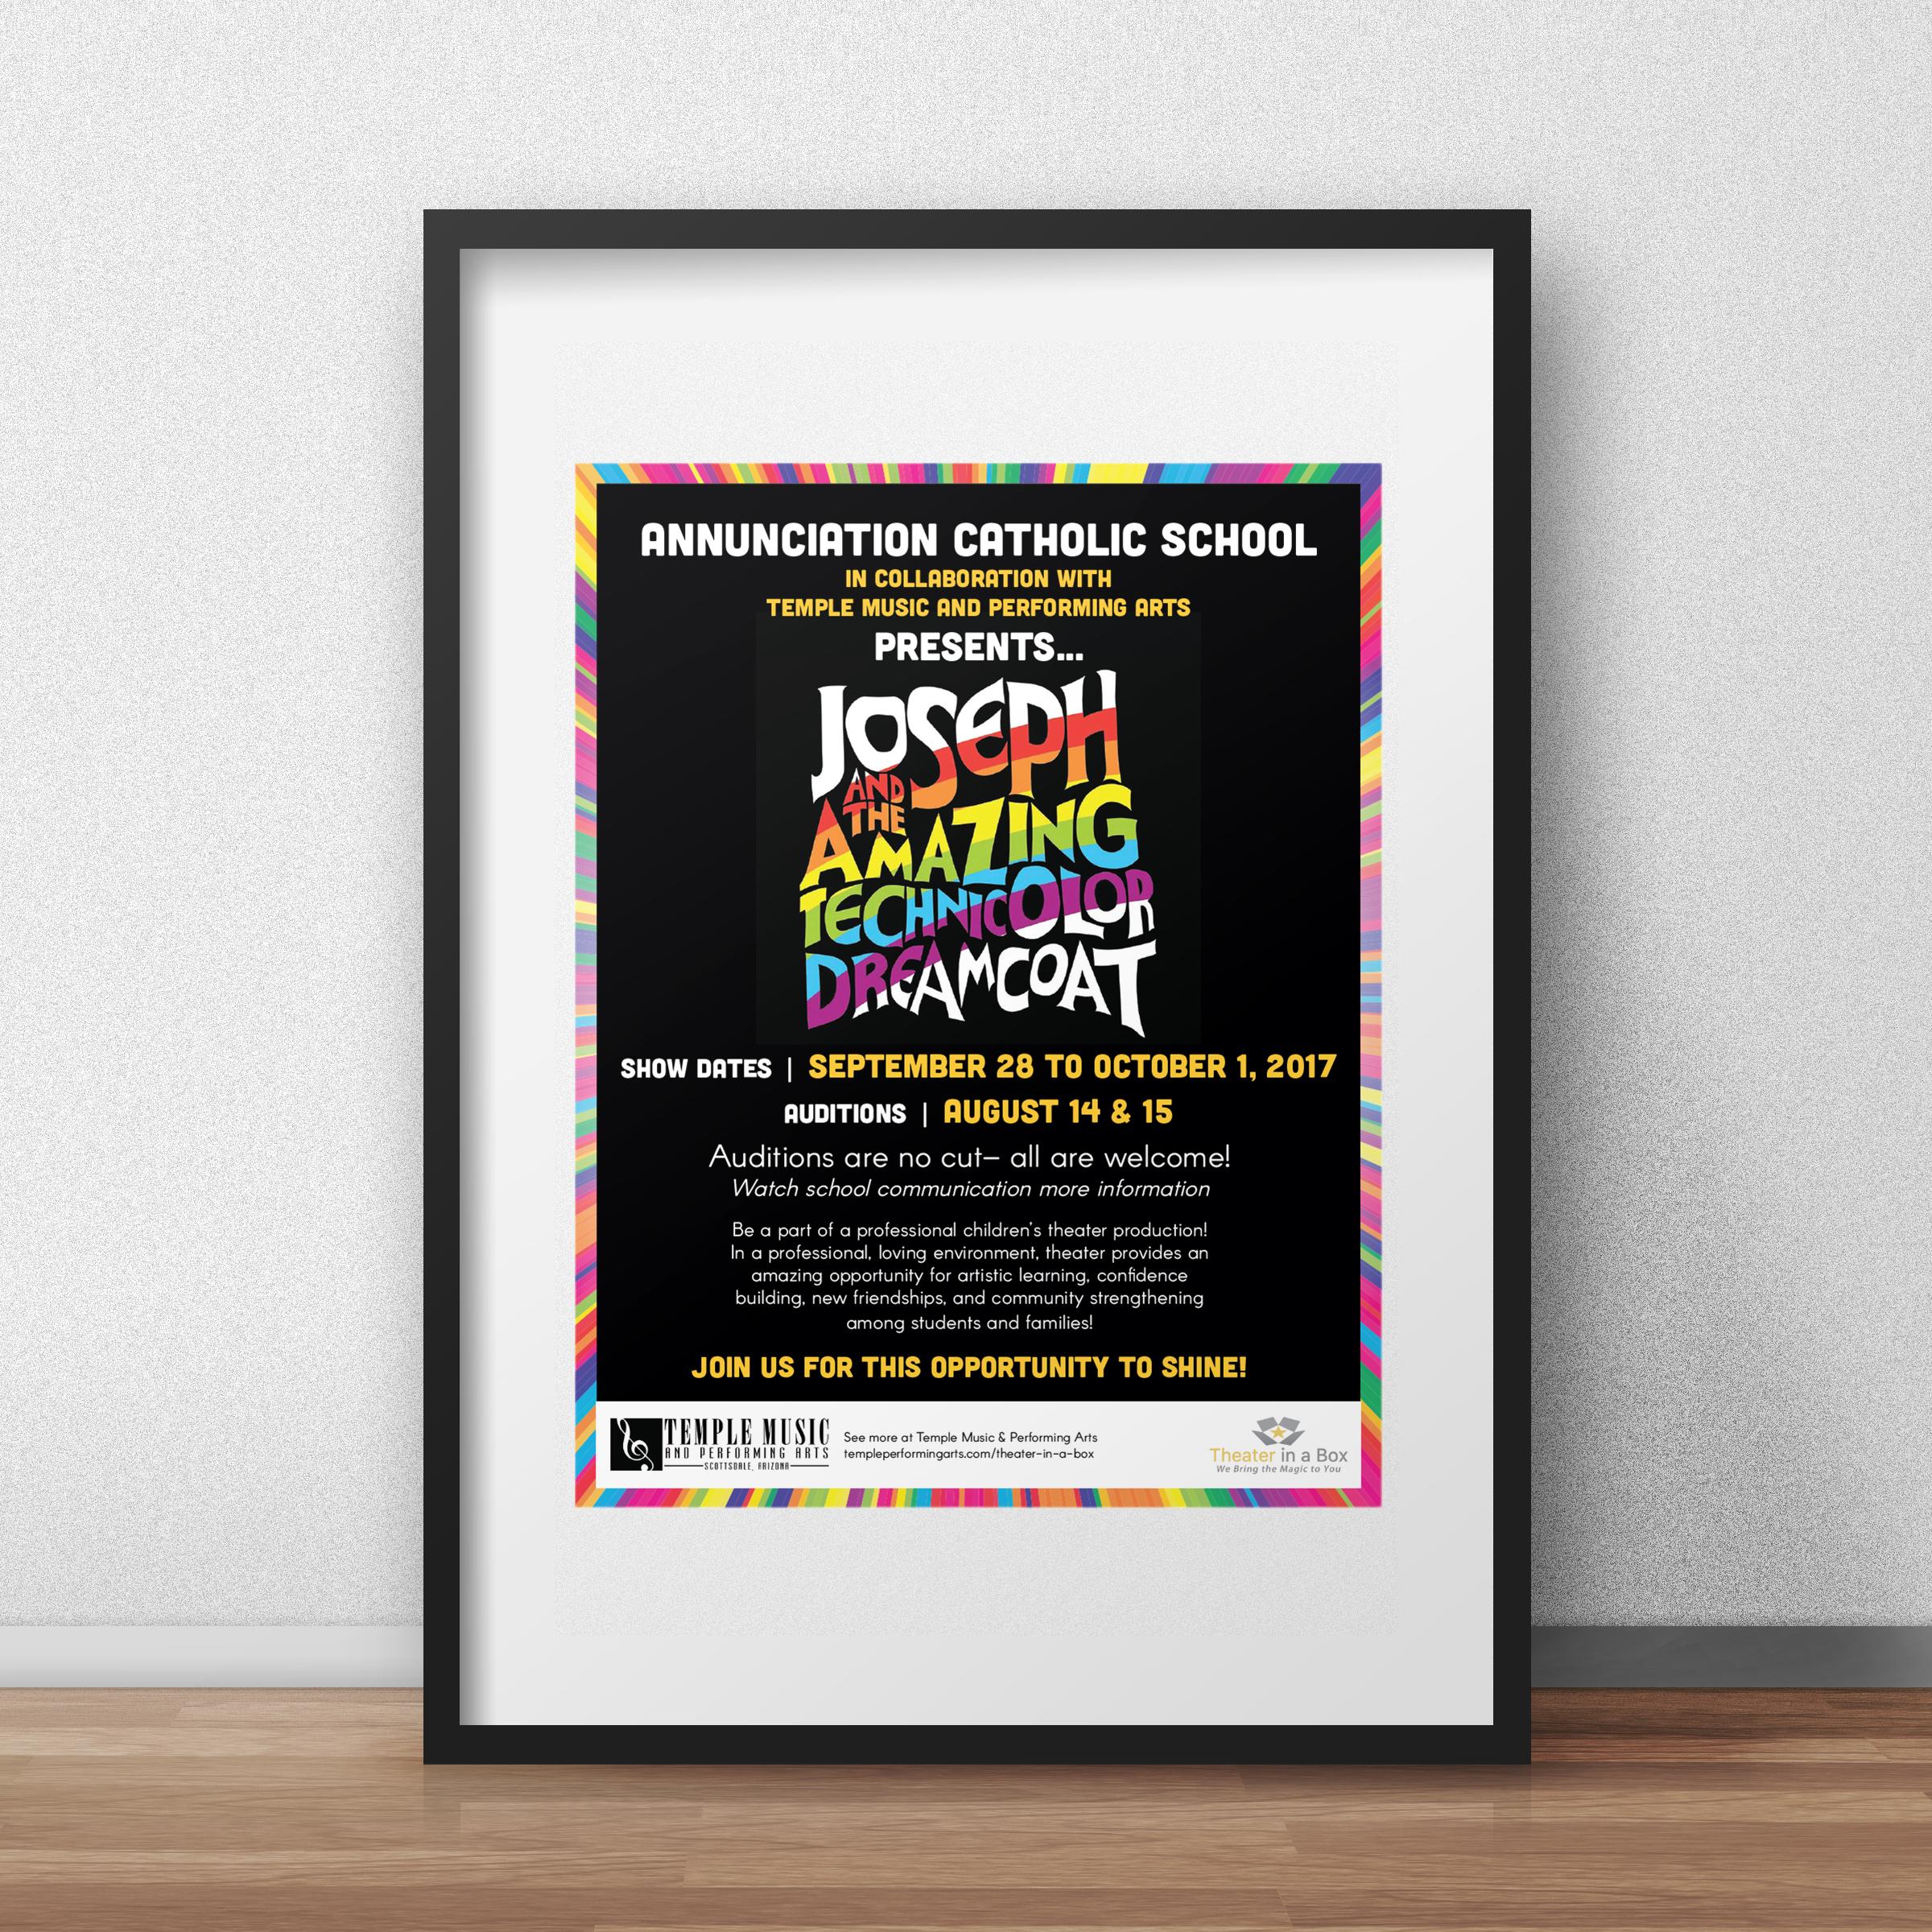 Joseph-and-the-Technicolor-Poster.jpg